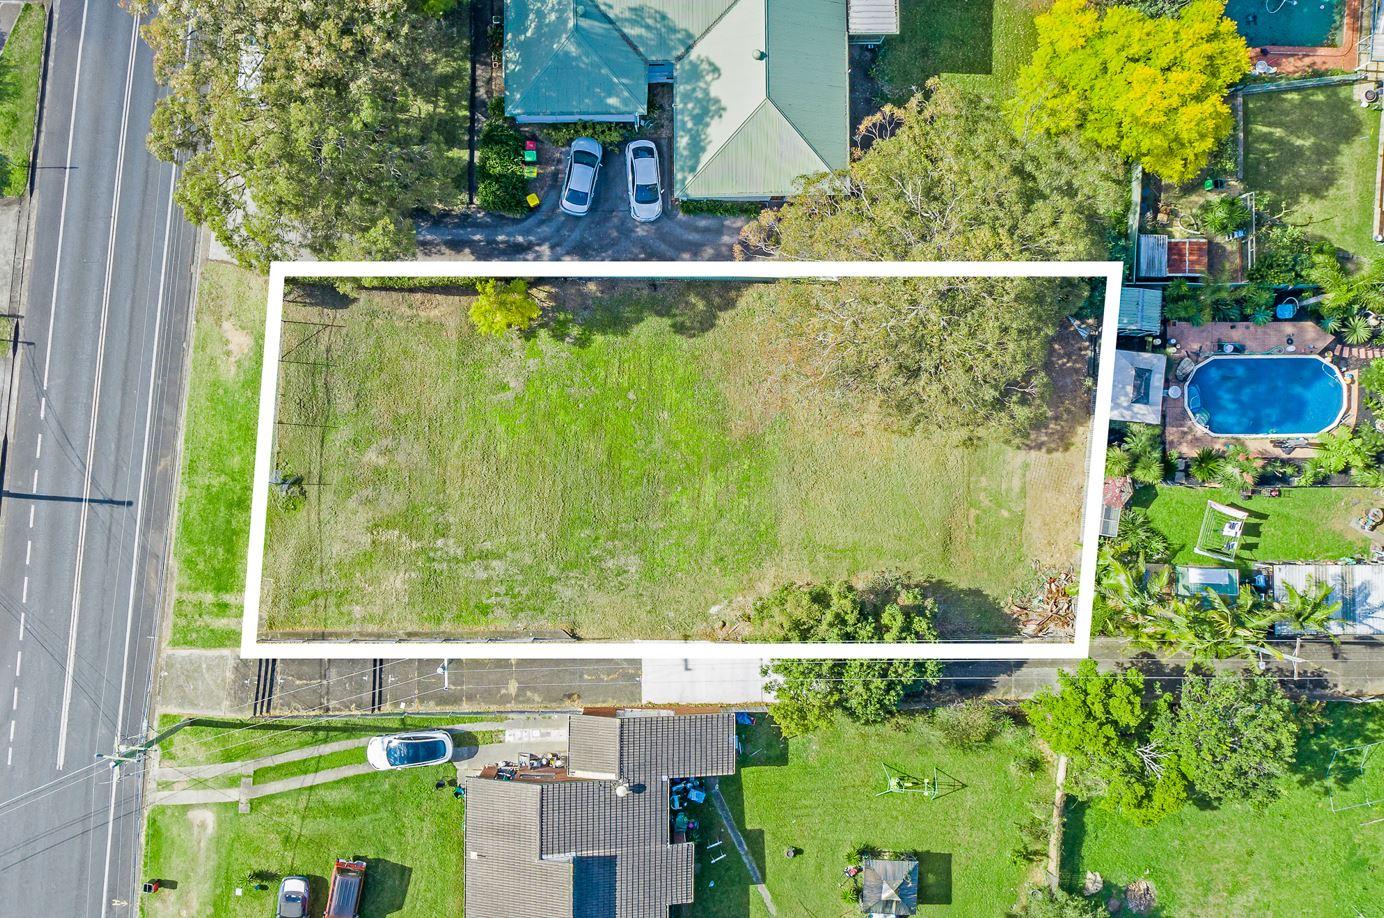 Land, Sold , 70, Listing ID 1485, Baulkham Hills, NSW, Australia, 2153,